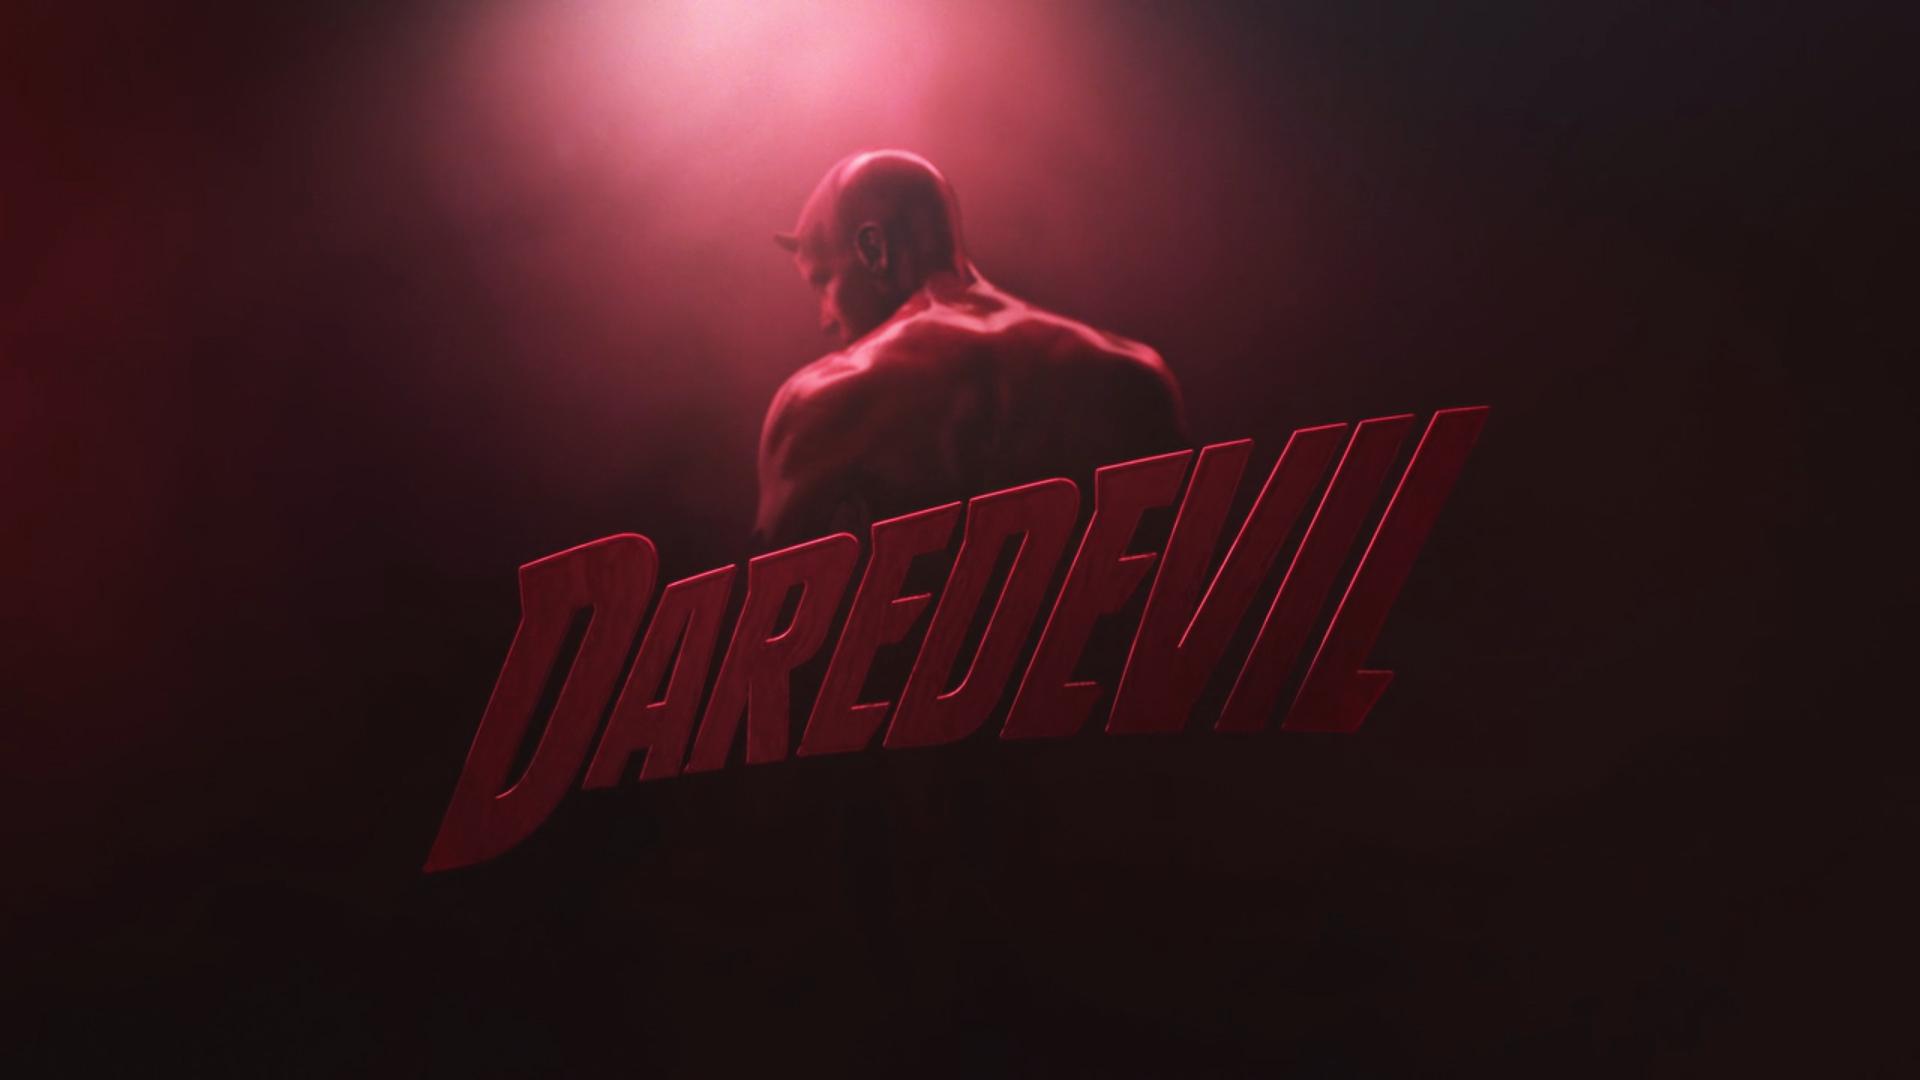 Marvels Daredevil TV Series Red Devil and Logo Intro Wallpaper 1920x1080